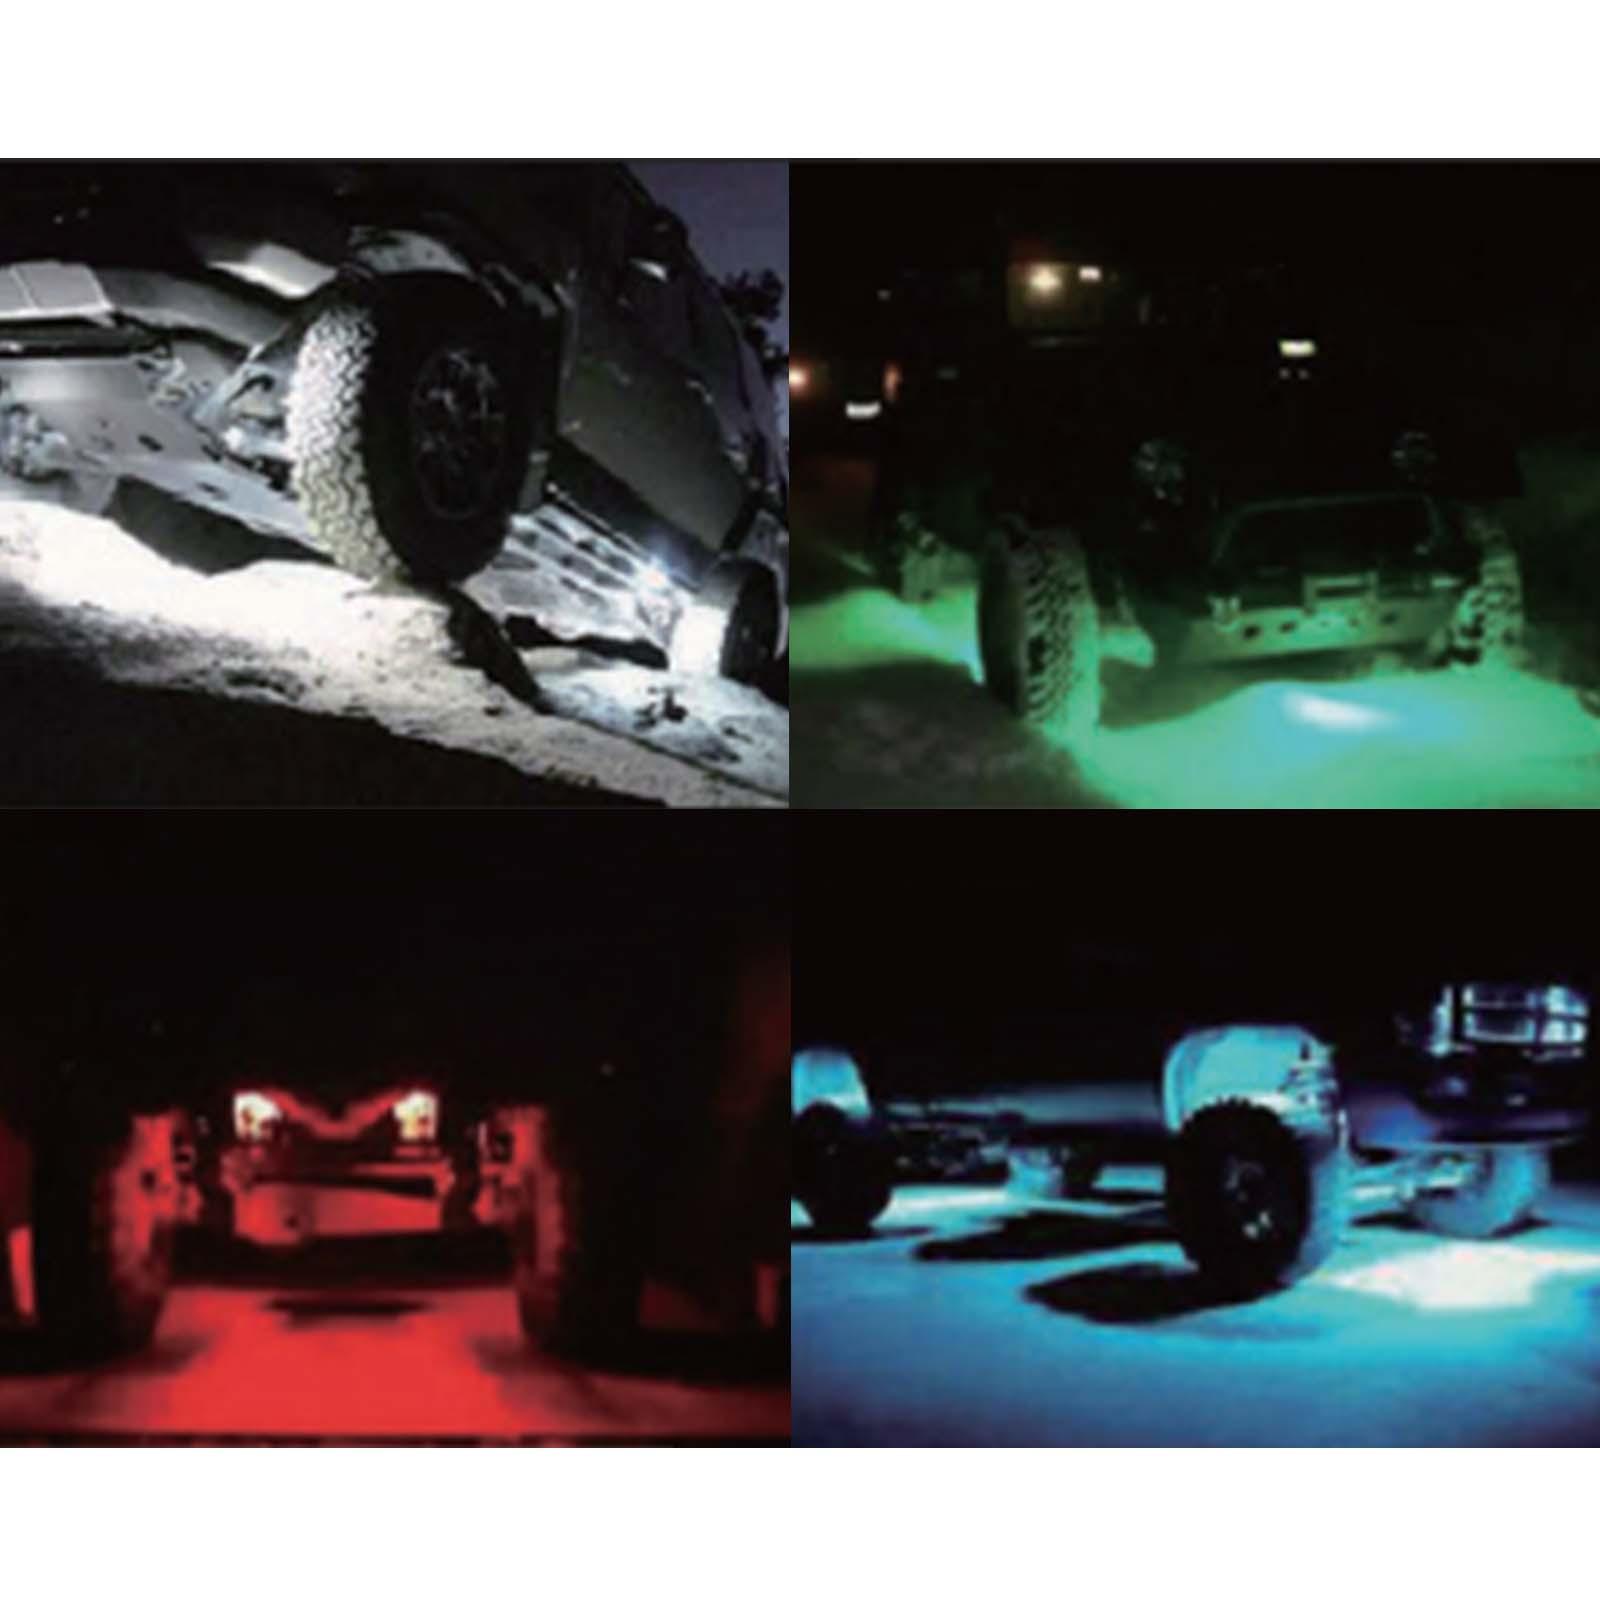 kawell cree led rgb rock light kits super bright led work